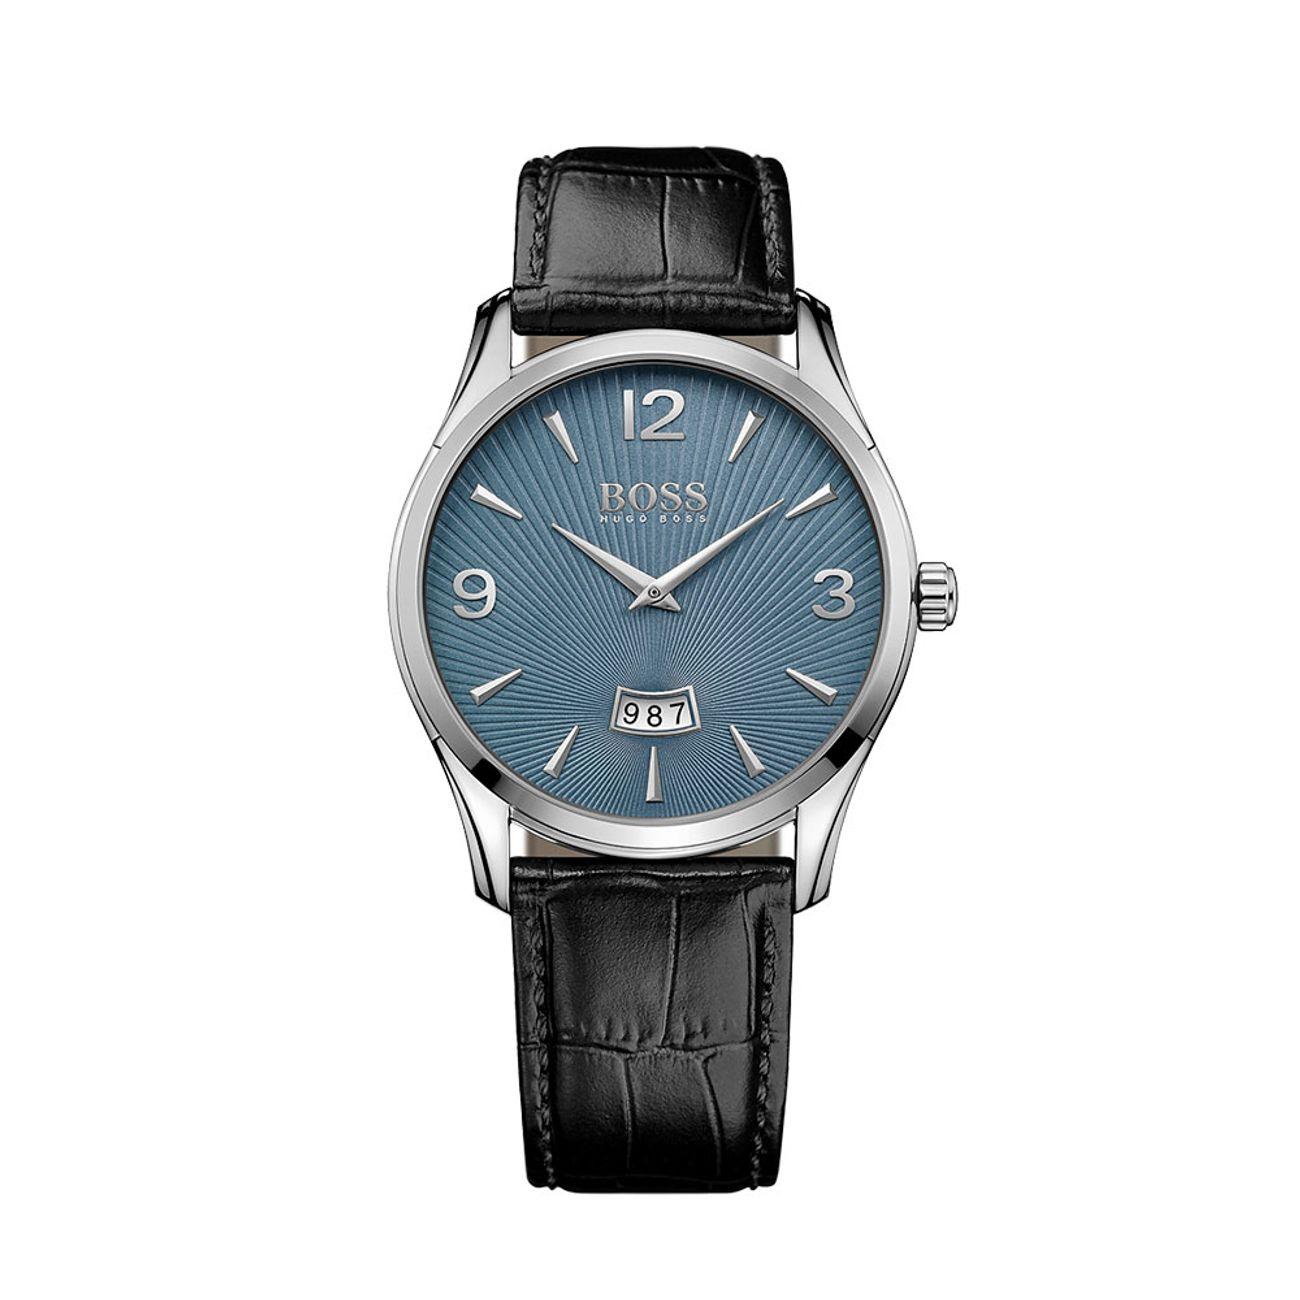 afc090a5a950 Hugo Boss COMMANDER - Style Watch